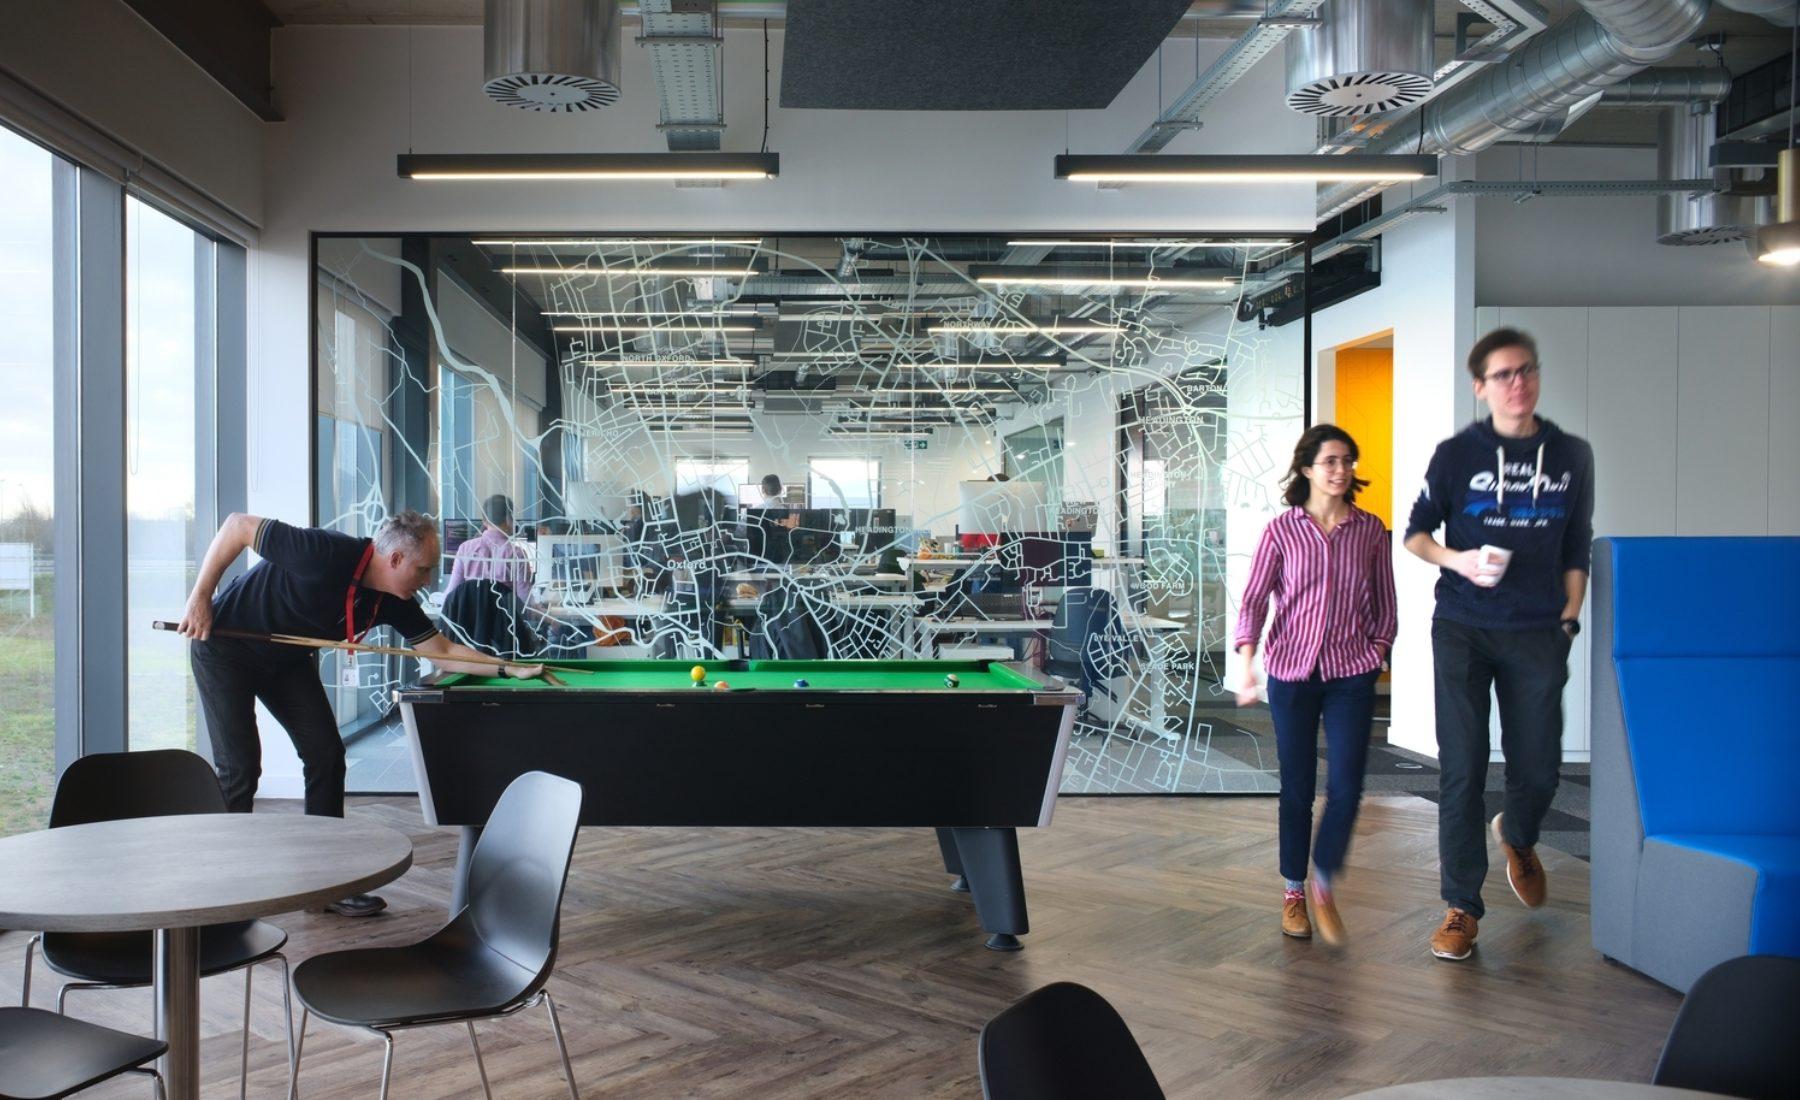 Perspectum office pool table